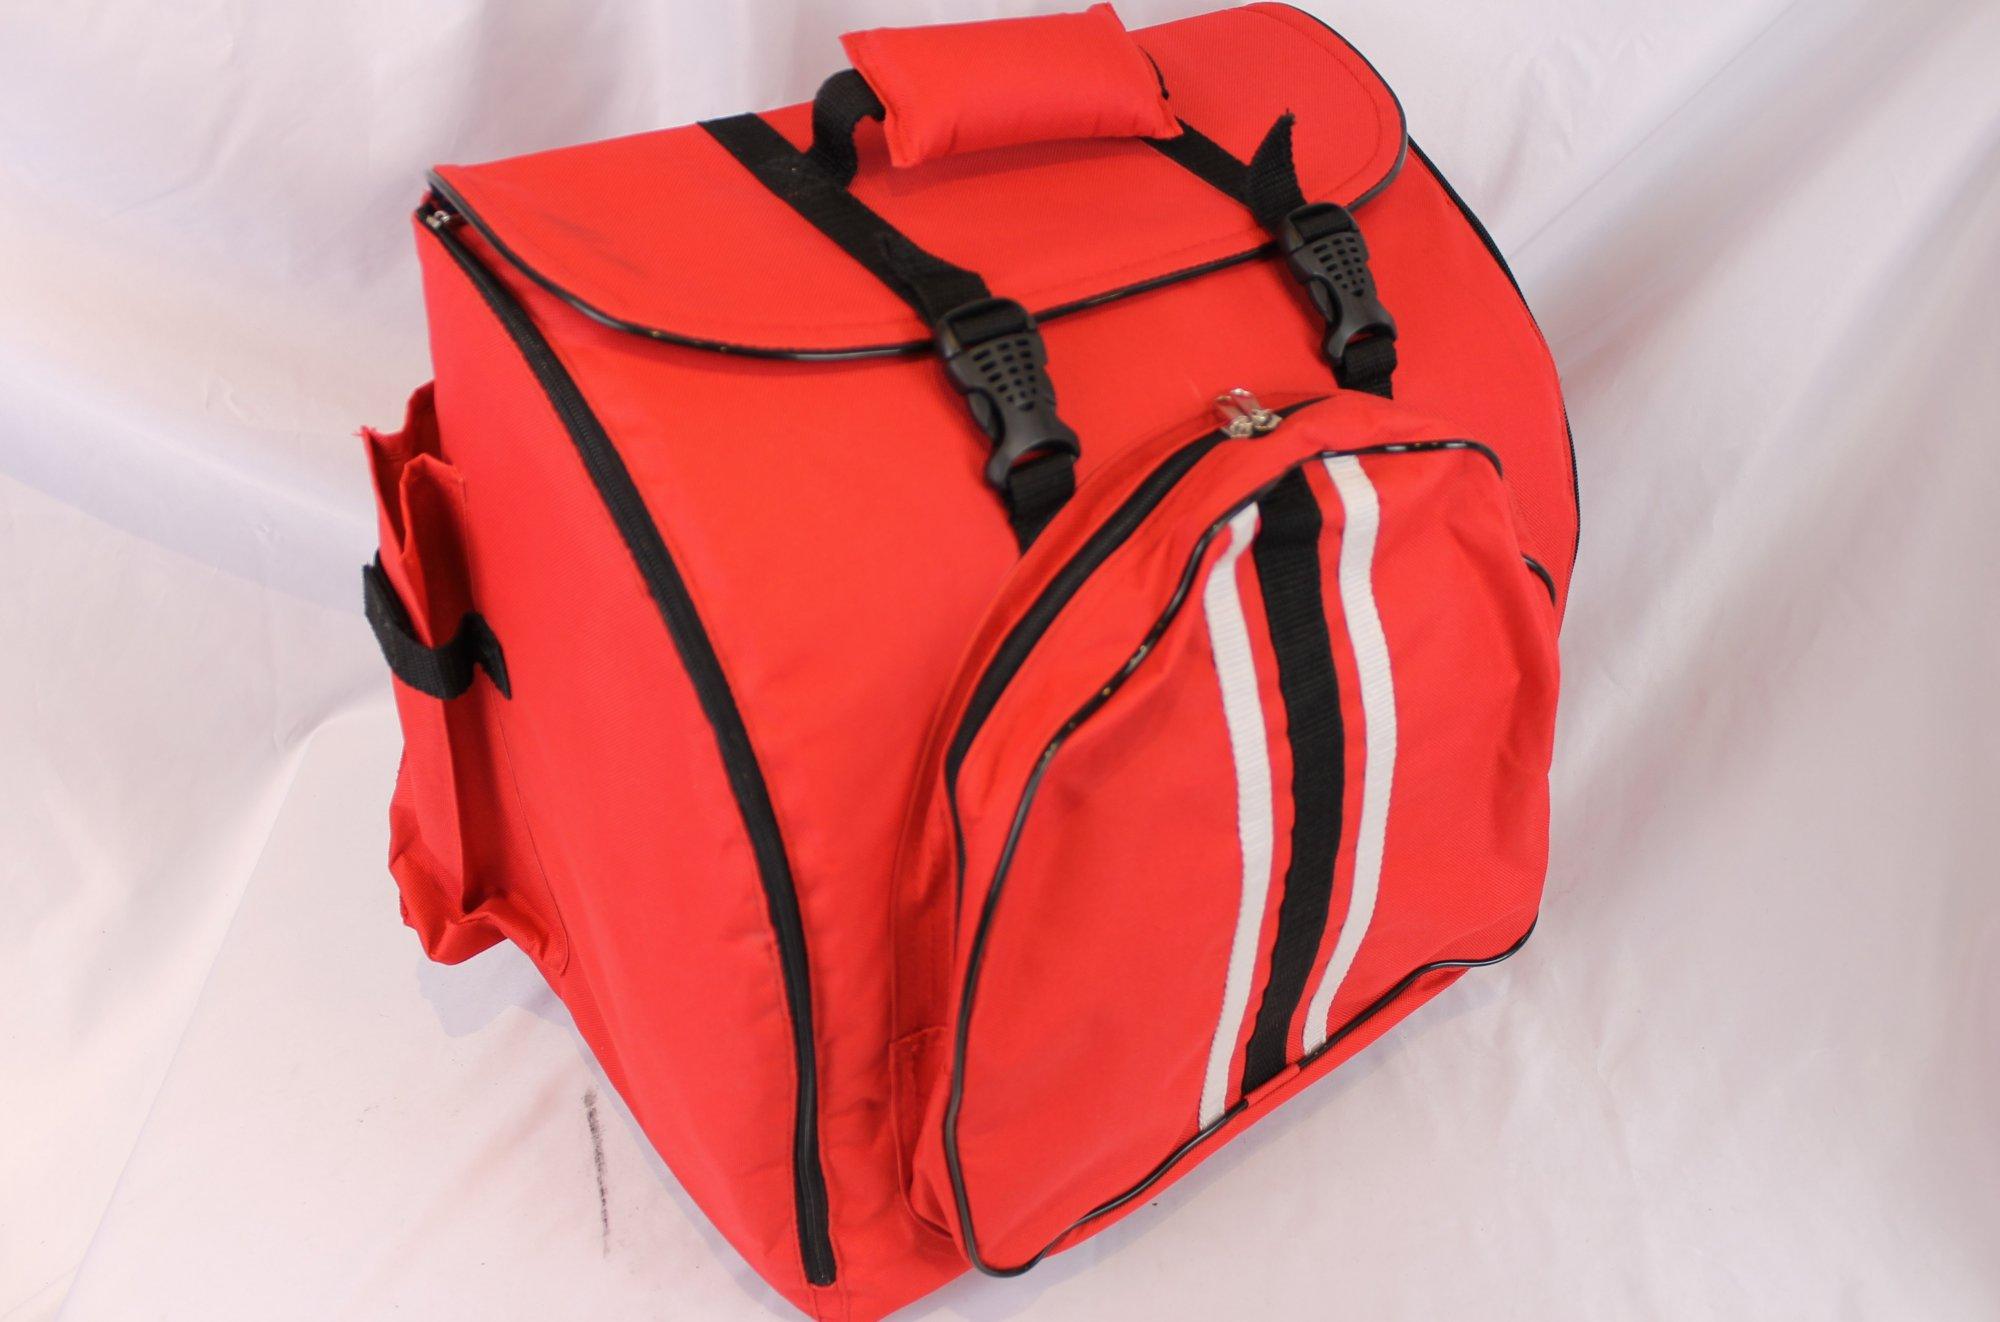 Red Soft Cse Gig Bag for Accordion 14.5 x 9 x 14 - Fits 48 Bass Accordions